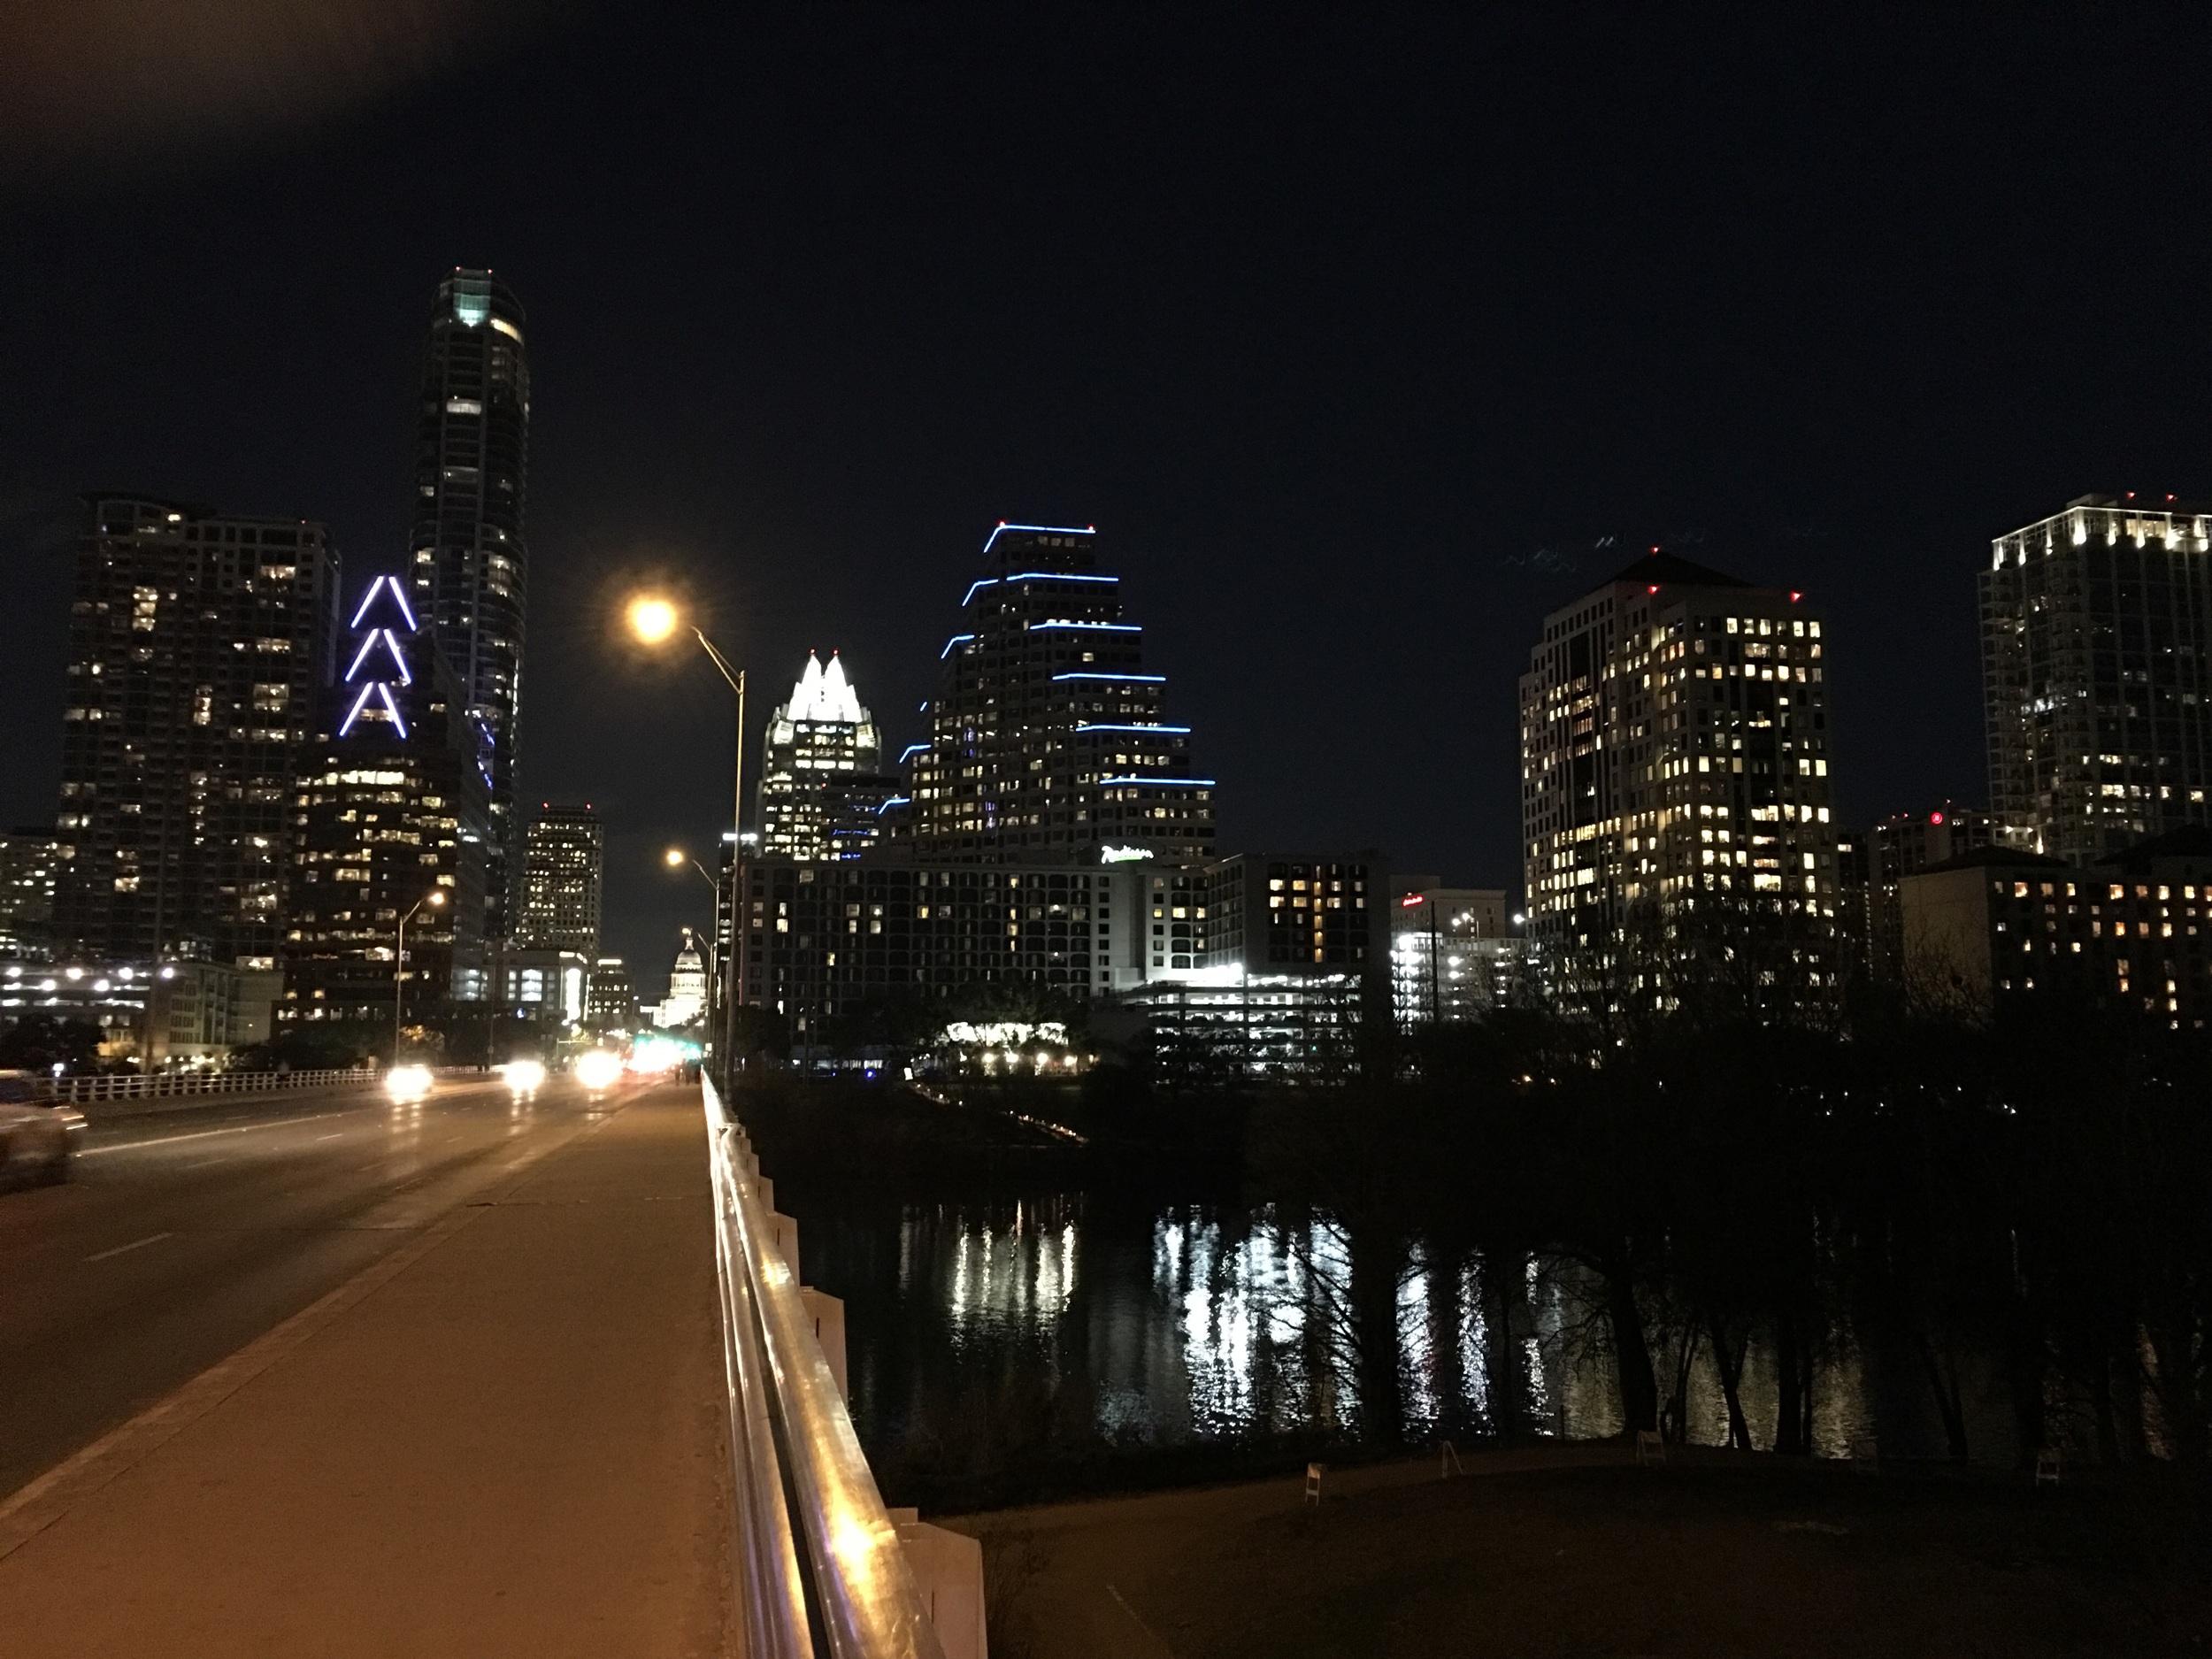 The Austin evening skyline